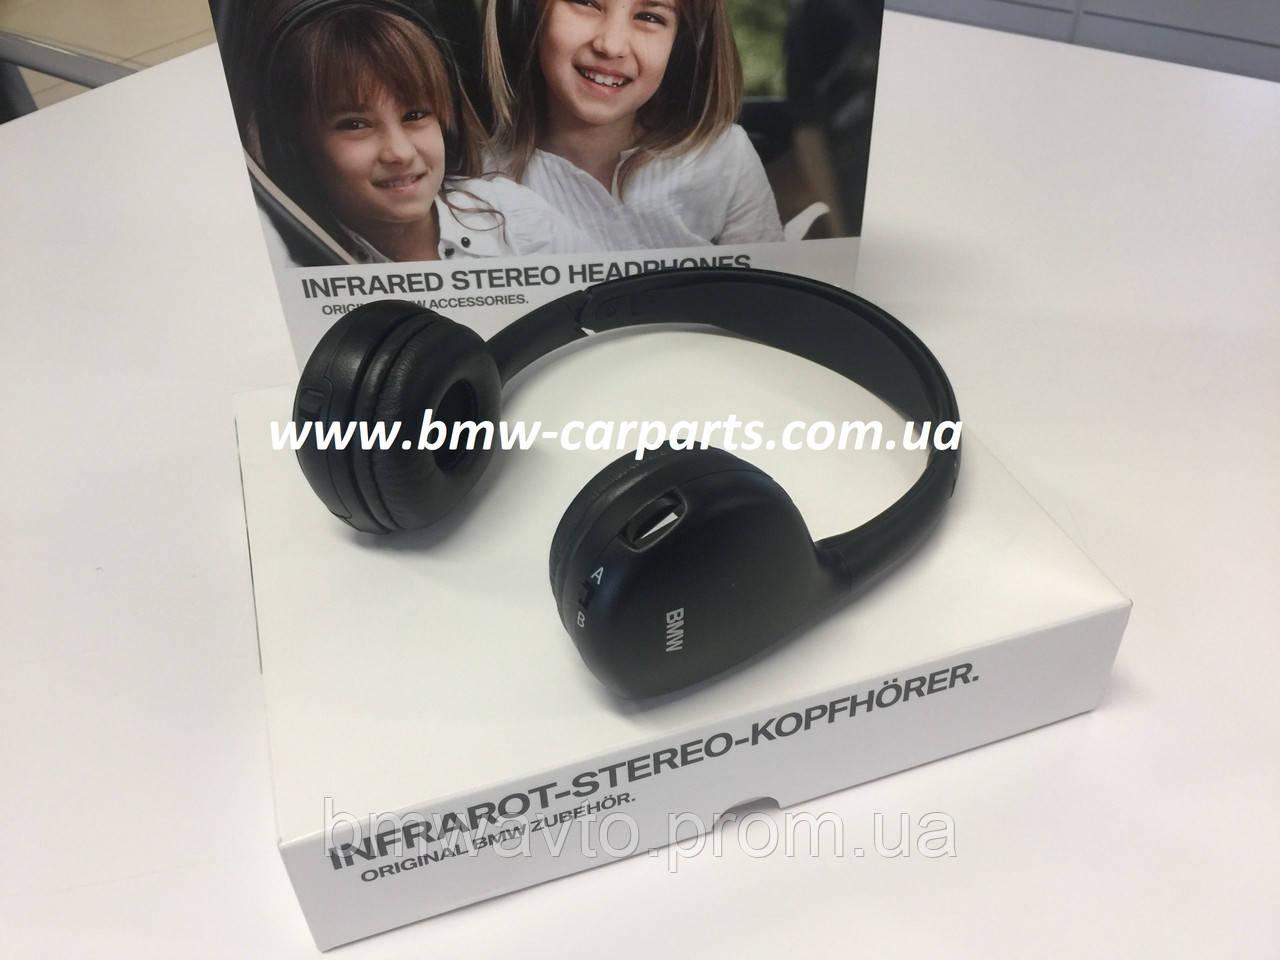 Навушники BMW Infrared stereo headphones, Mod2